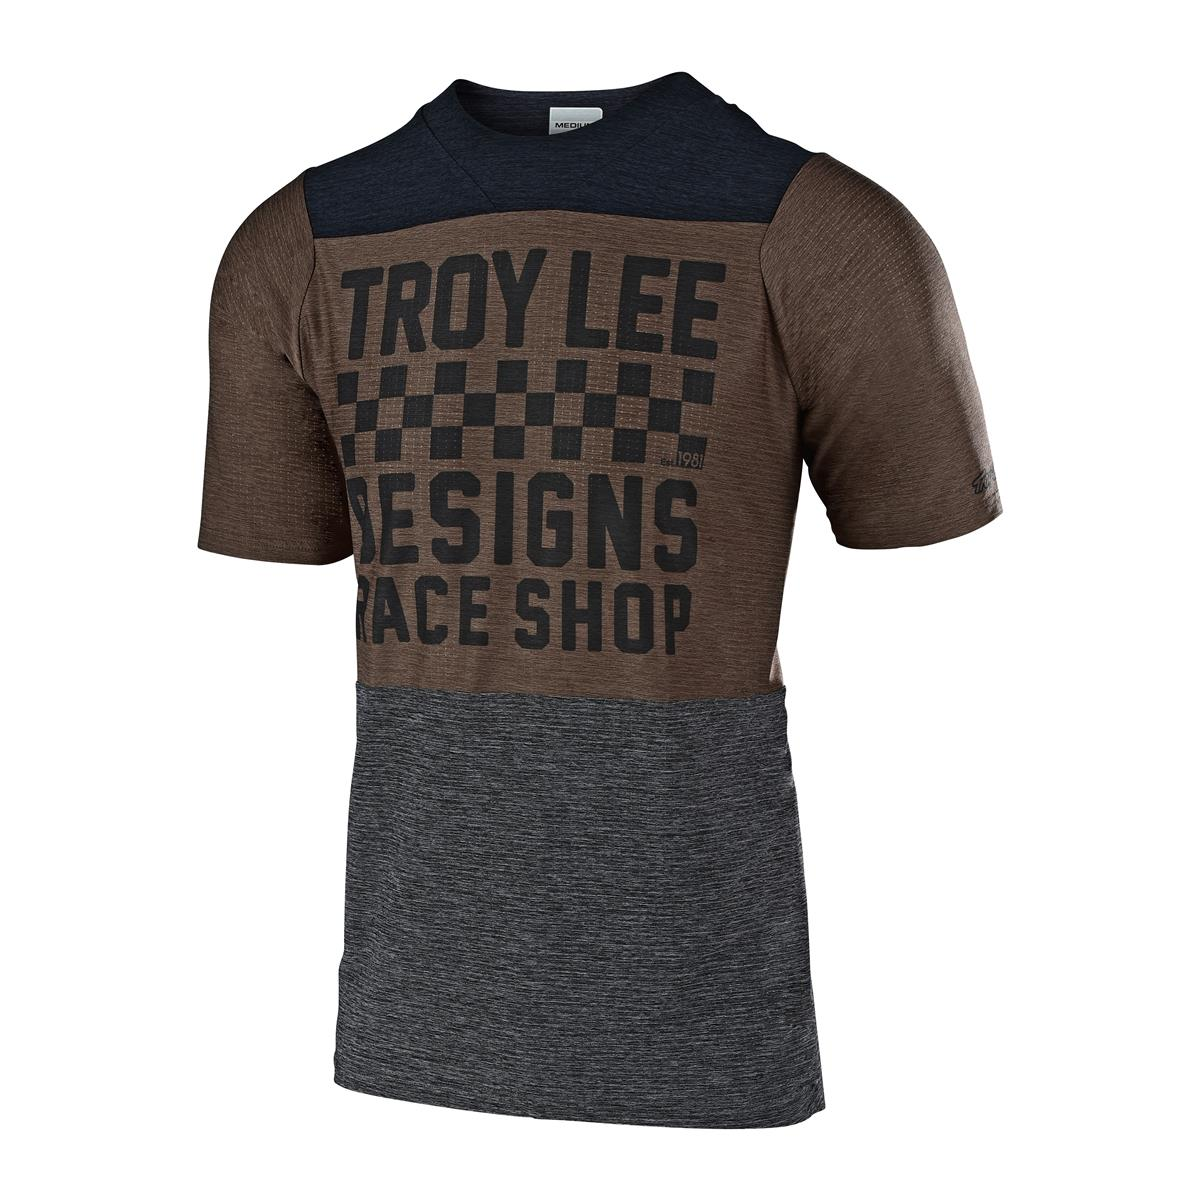 Troy Lee Designs Trail-Jersey Skyline Air Checkers - Heather Black/Heather Light Mokka